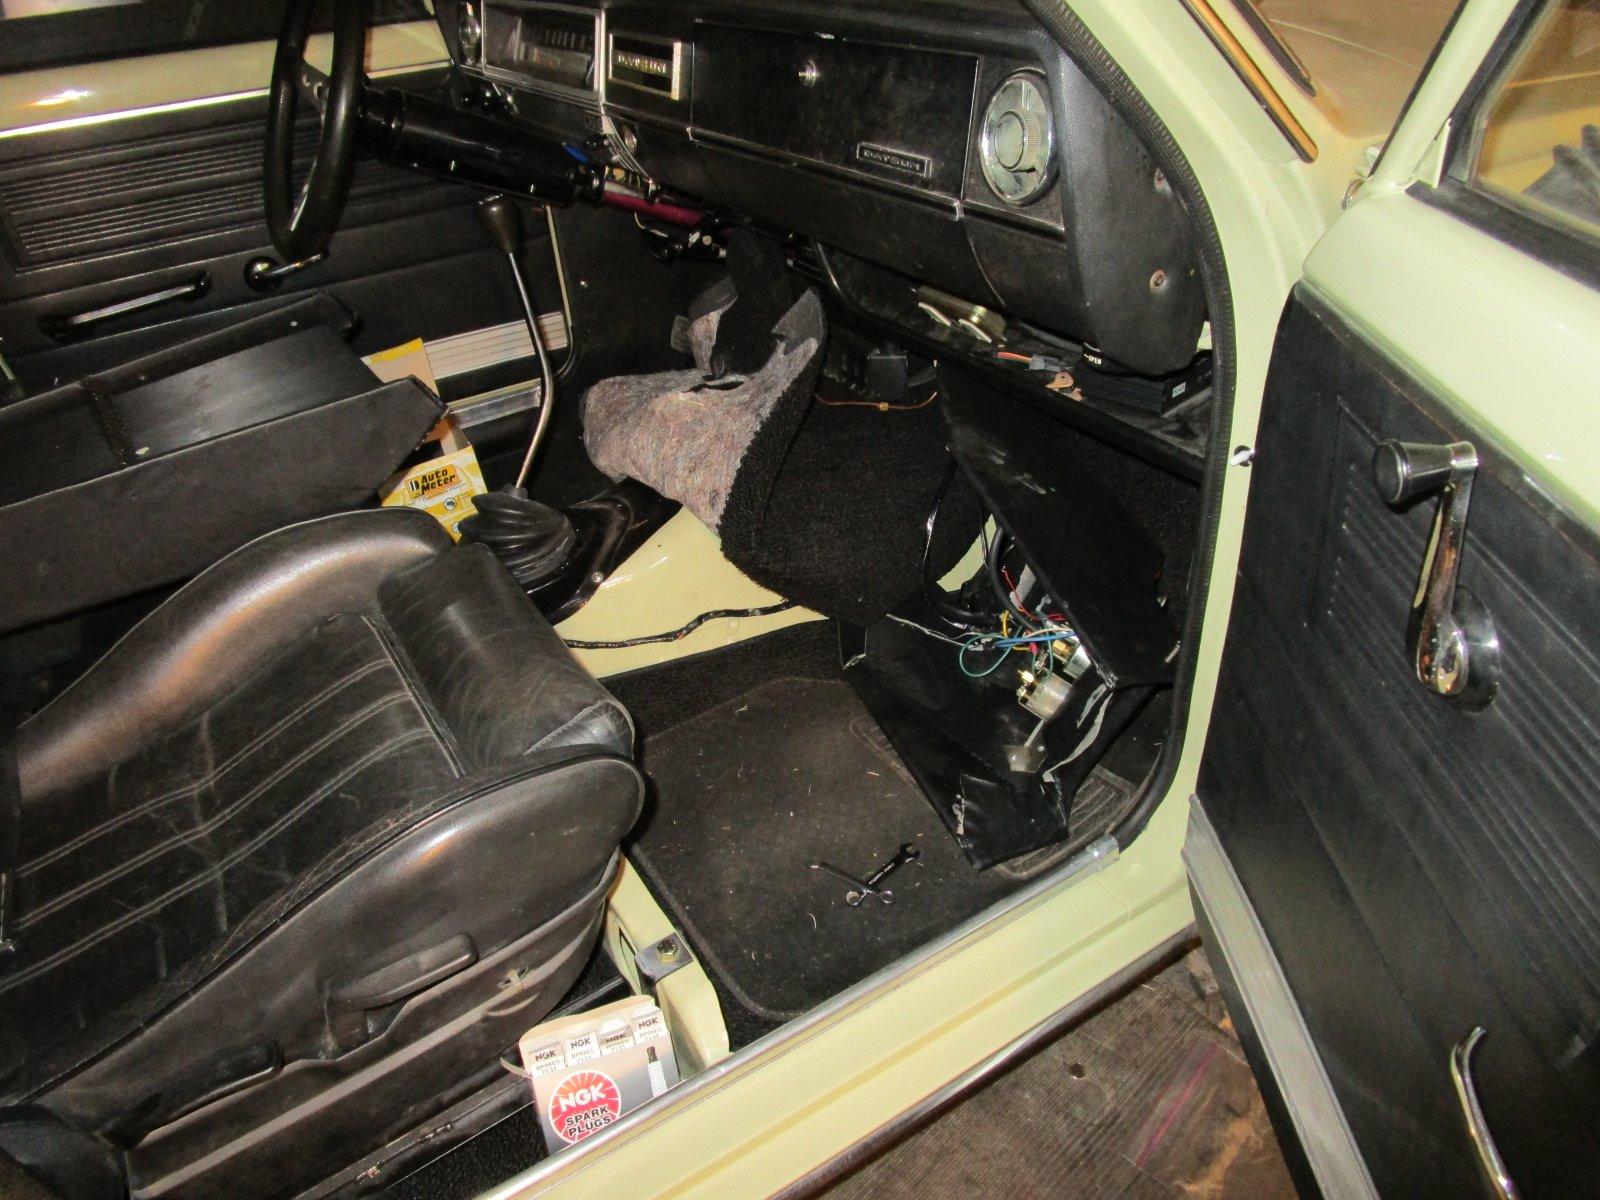 68 datsun 510 3 peice front carpet IMG_2038.jpg